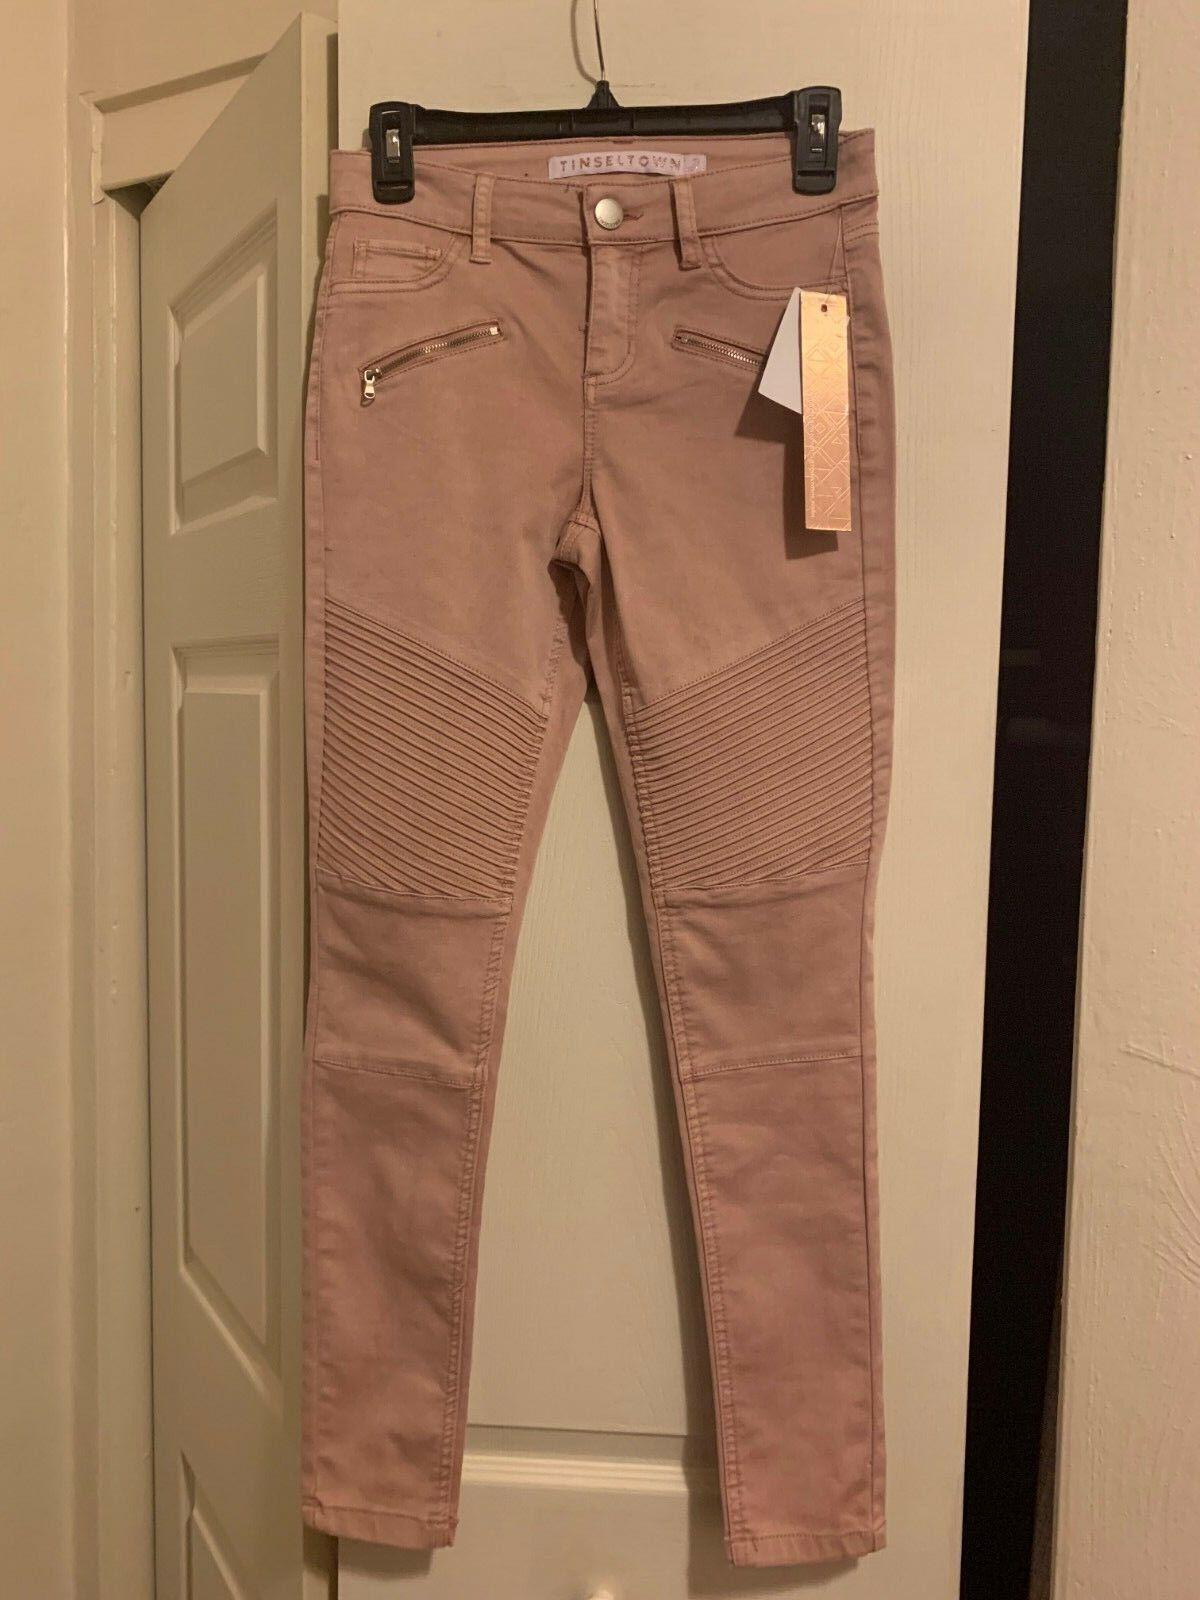 Tinseltown Juniors Size 3 bluesh Skinny Zippered Jeans Reg.  48